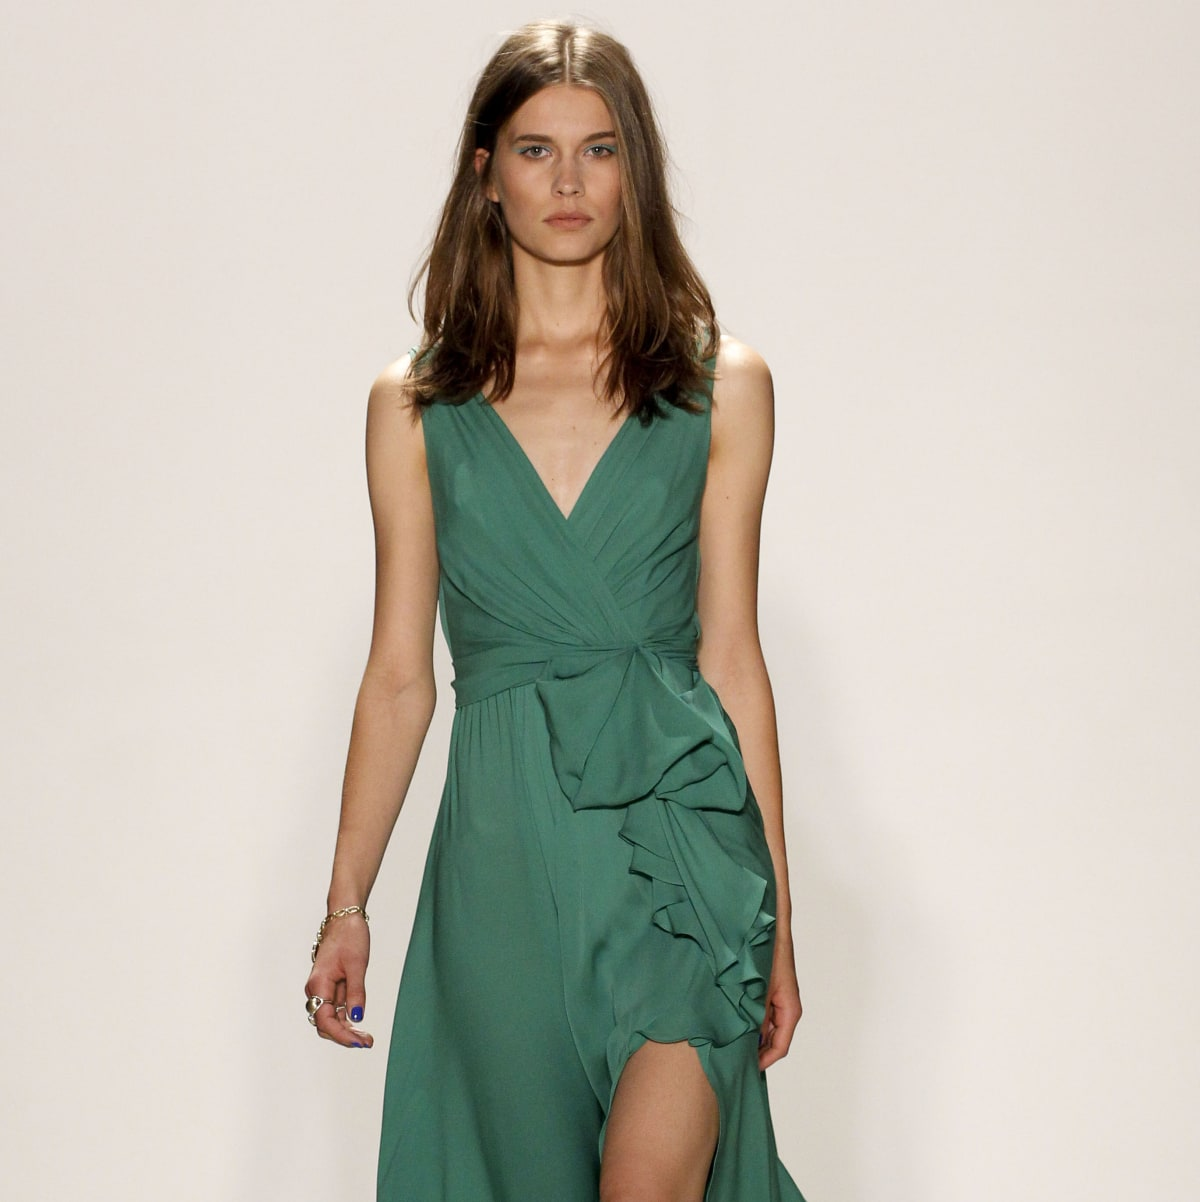 Jenny Packham spring 2016 look 30